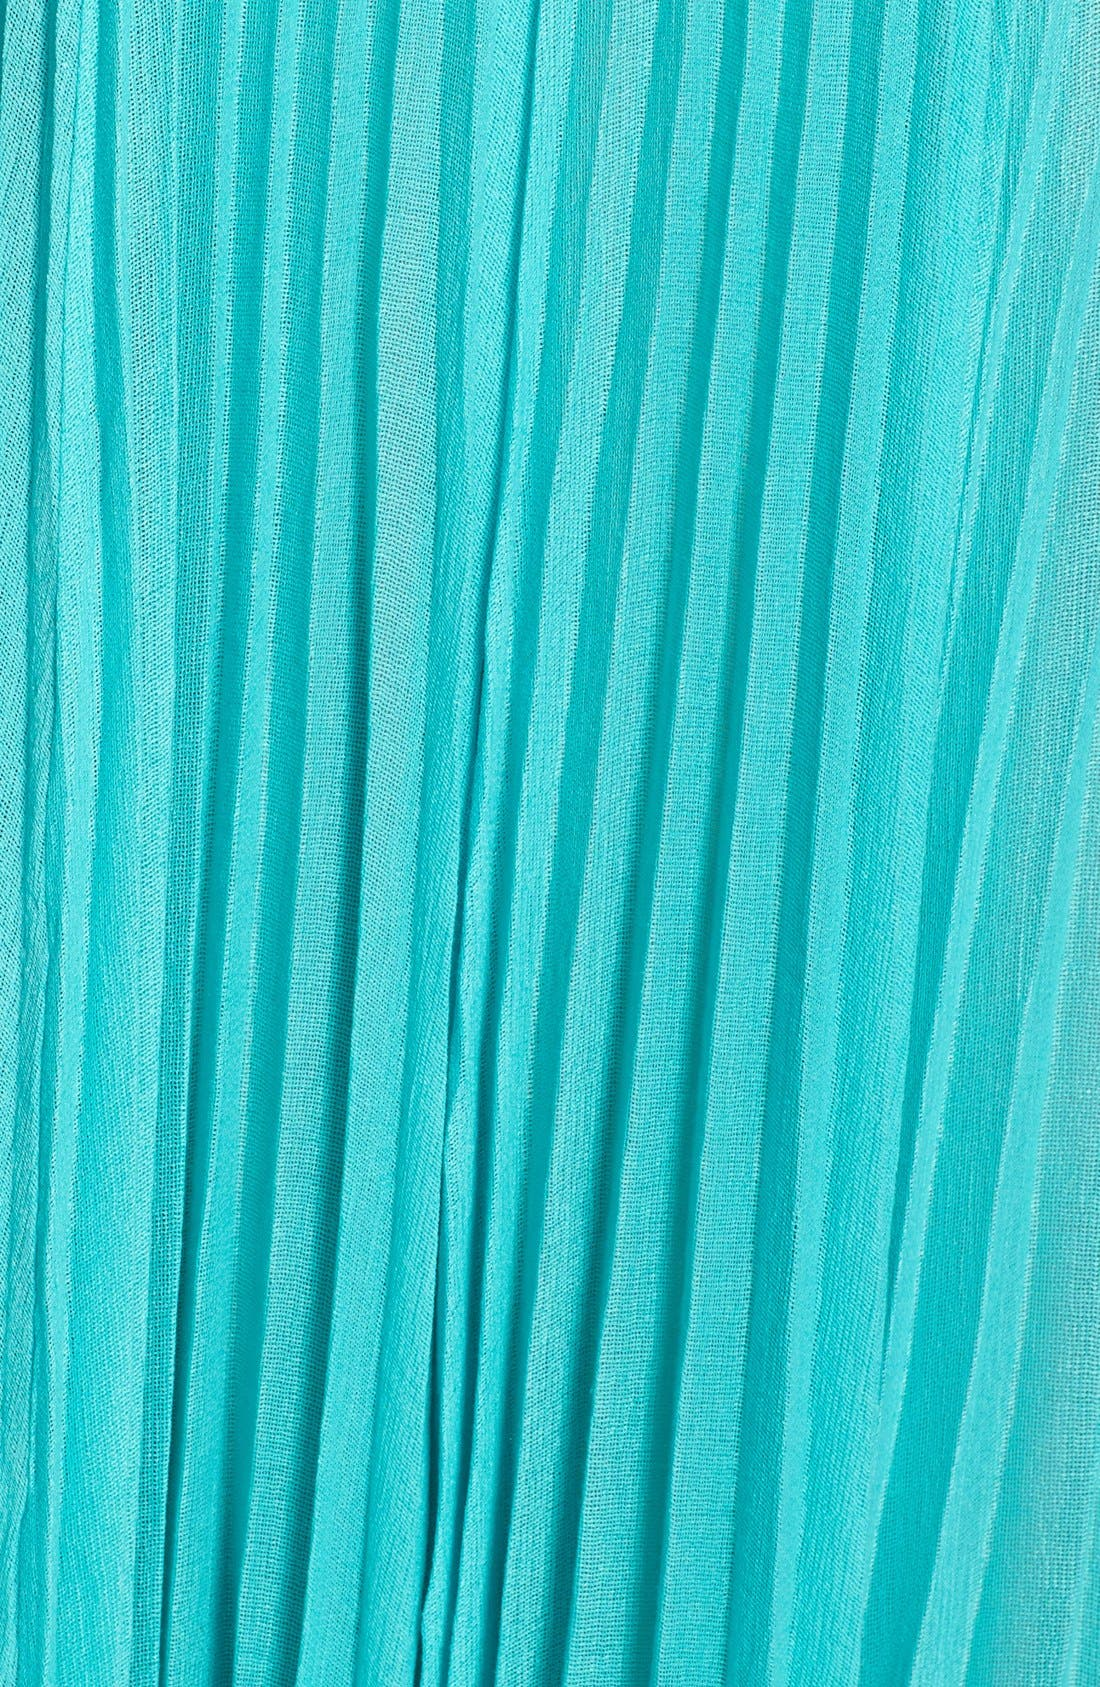 Alternate Image 3  - BCBGMAXAZRIA 'Brynna' T-Strap Back Maxi Dress